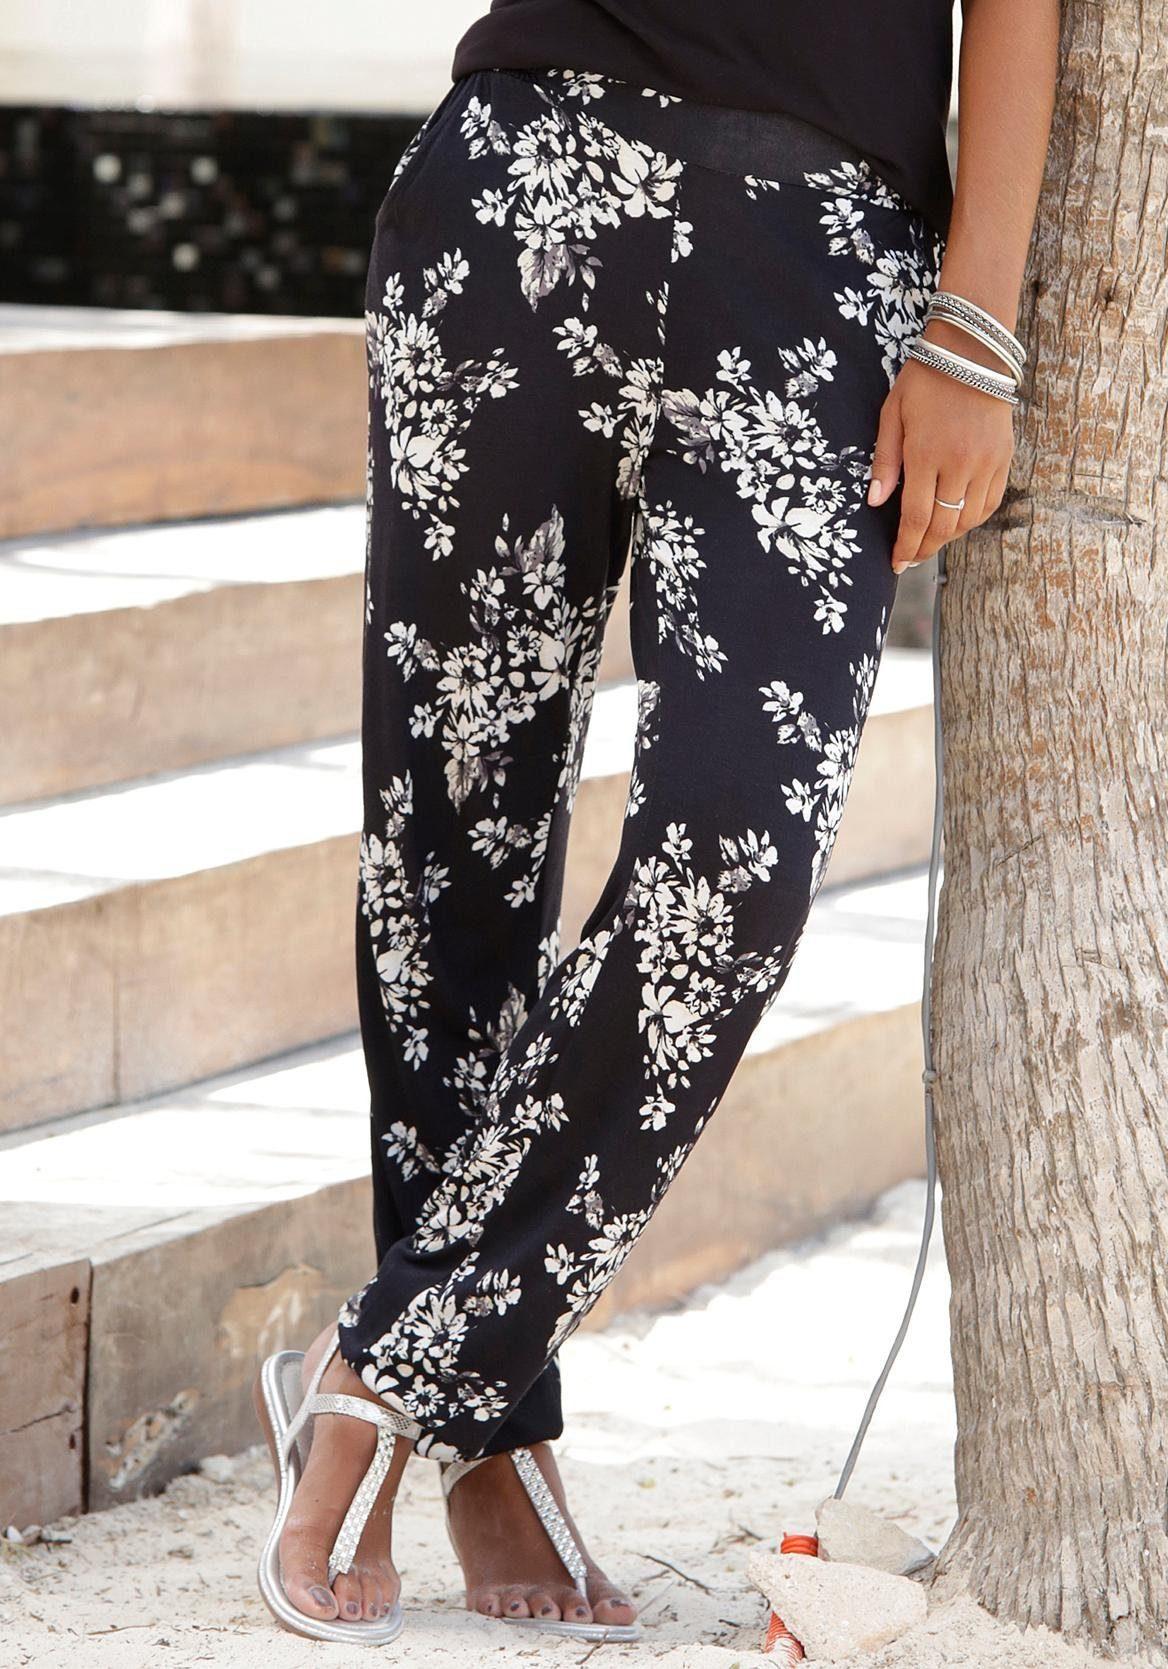 LASCANA Strandhose mit dezentem Blumendruck